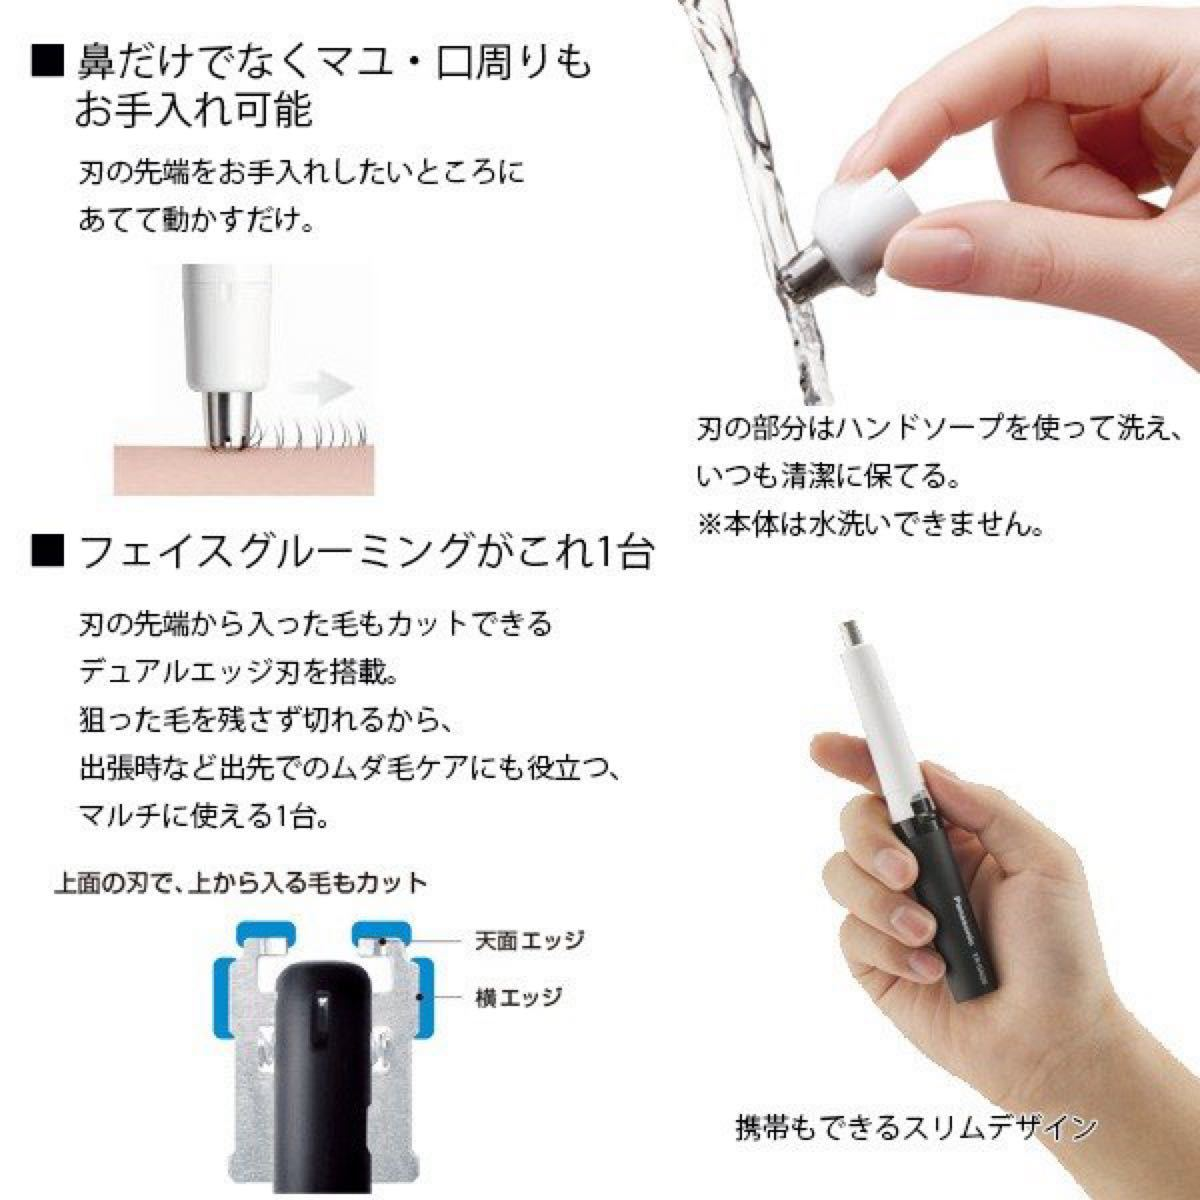 Panasonic エチケットカッター 鼻毛カッター グルーミング ブラック